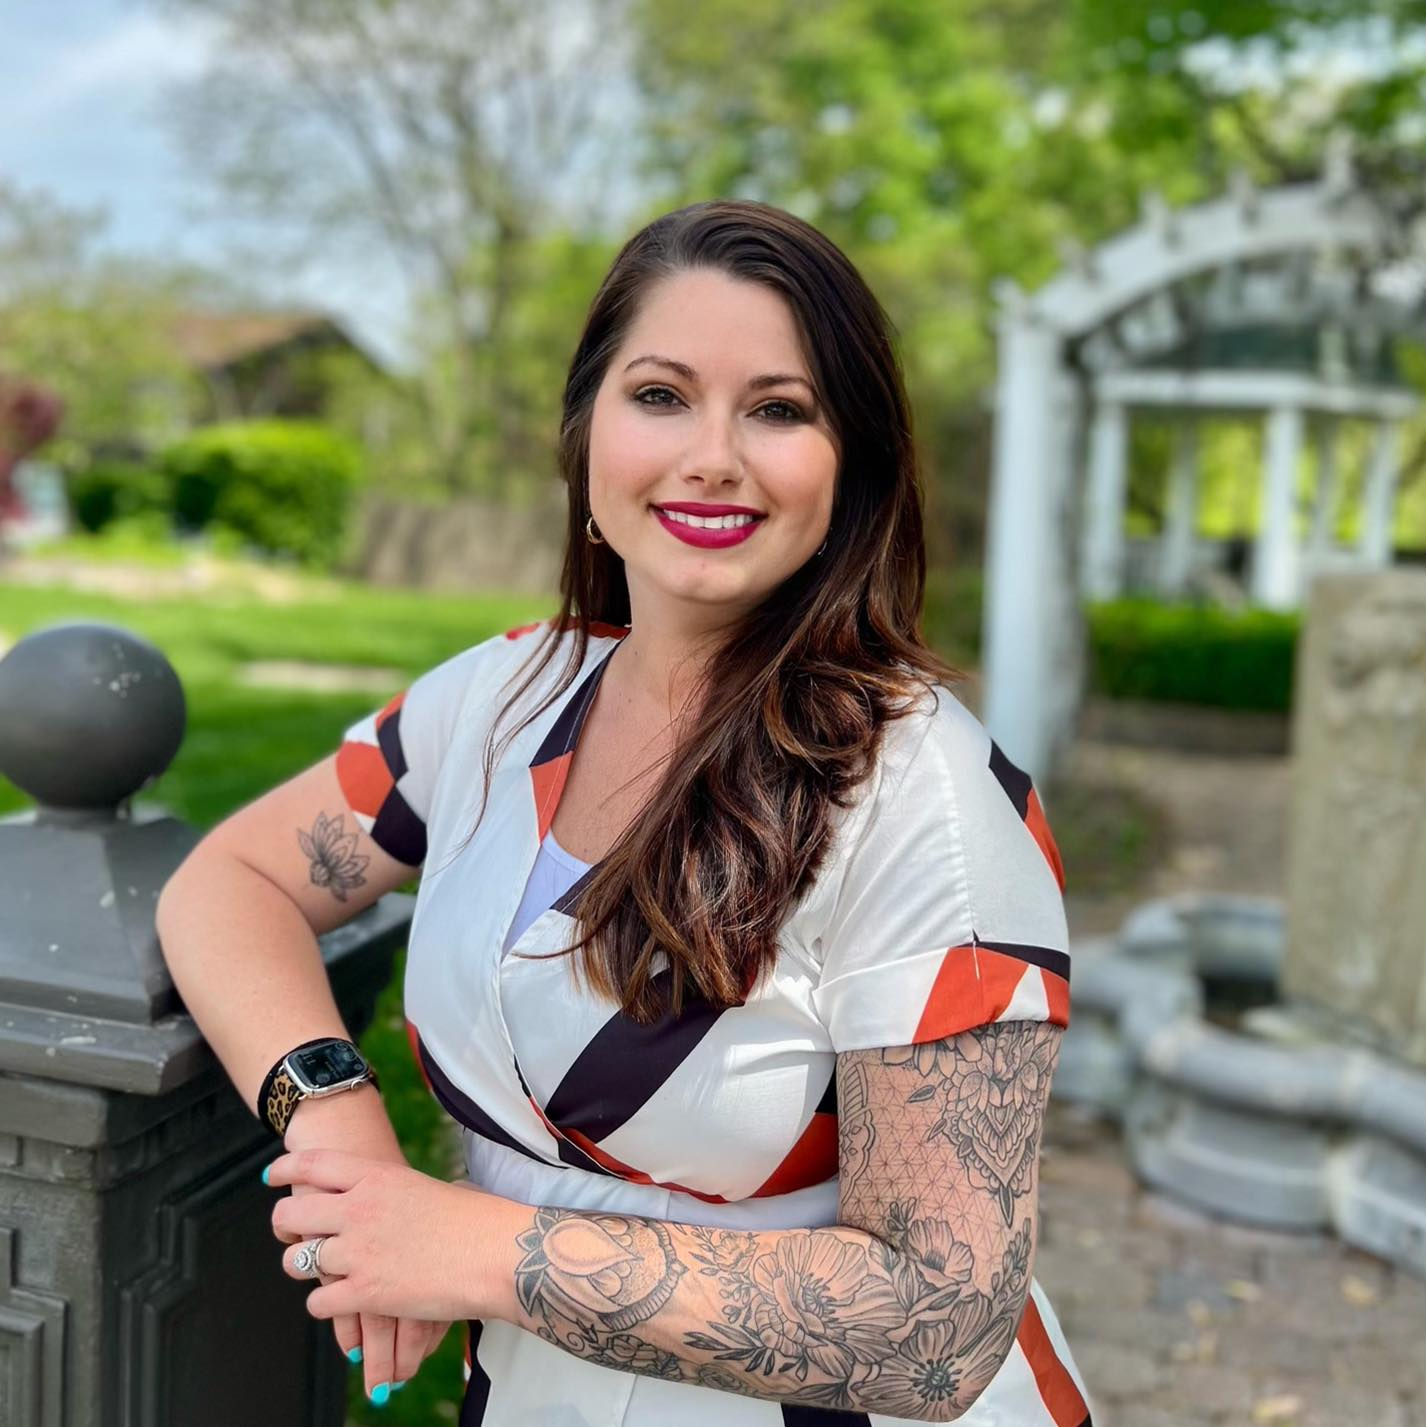 Sheena M. Valladares